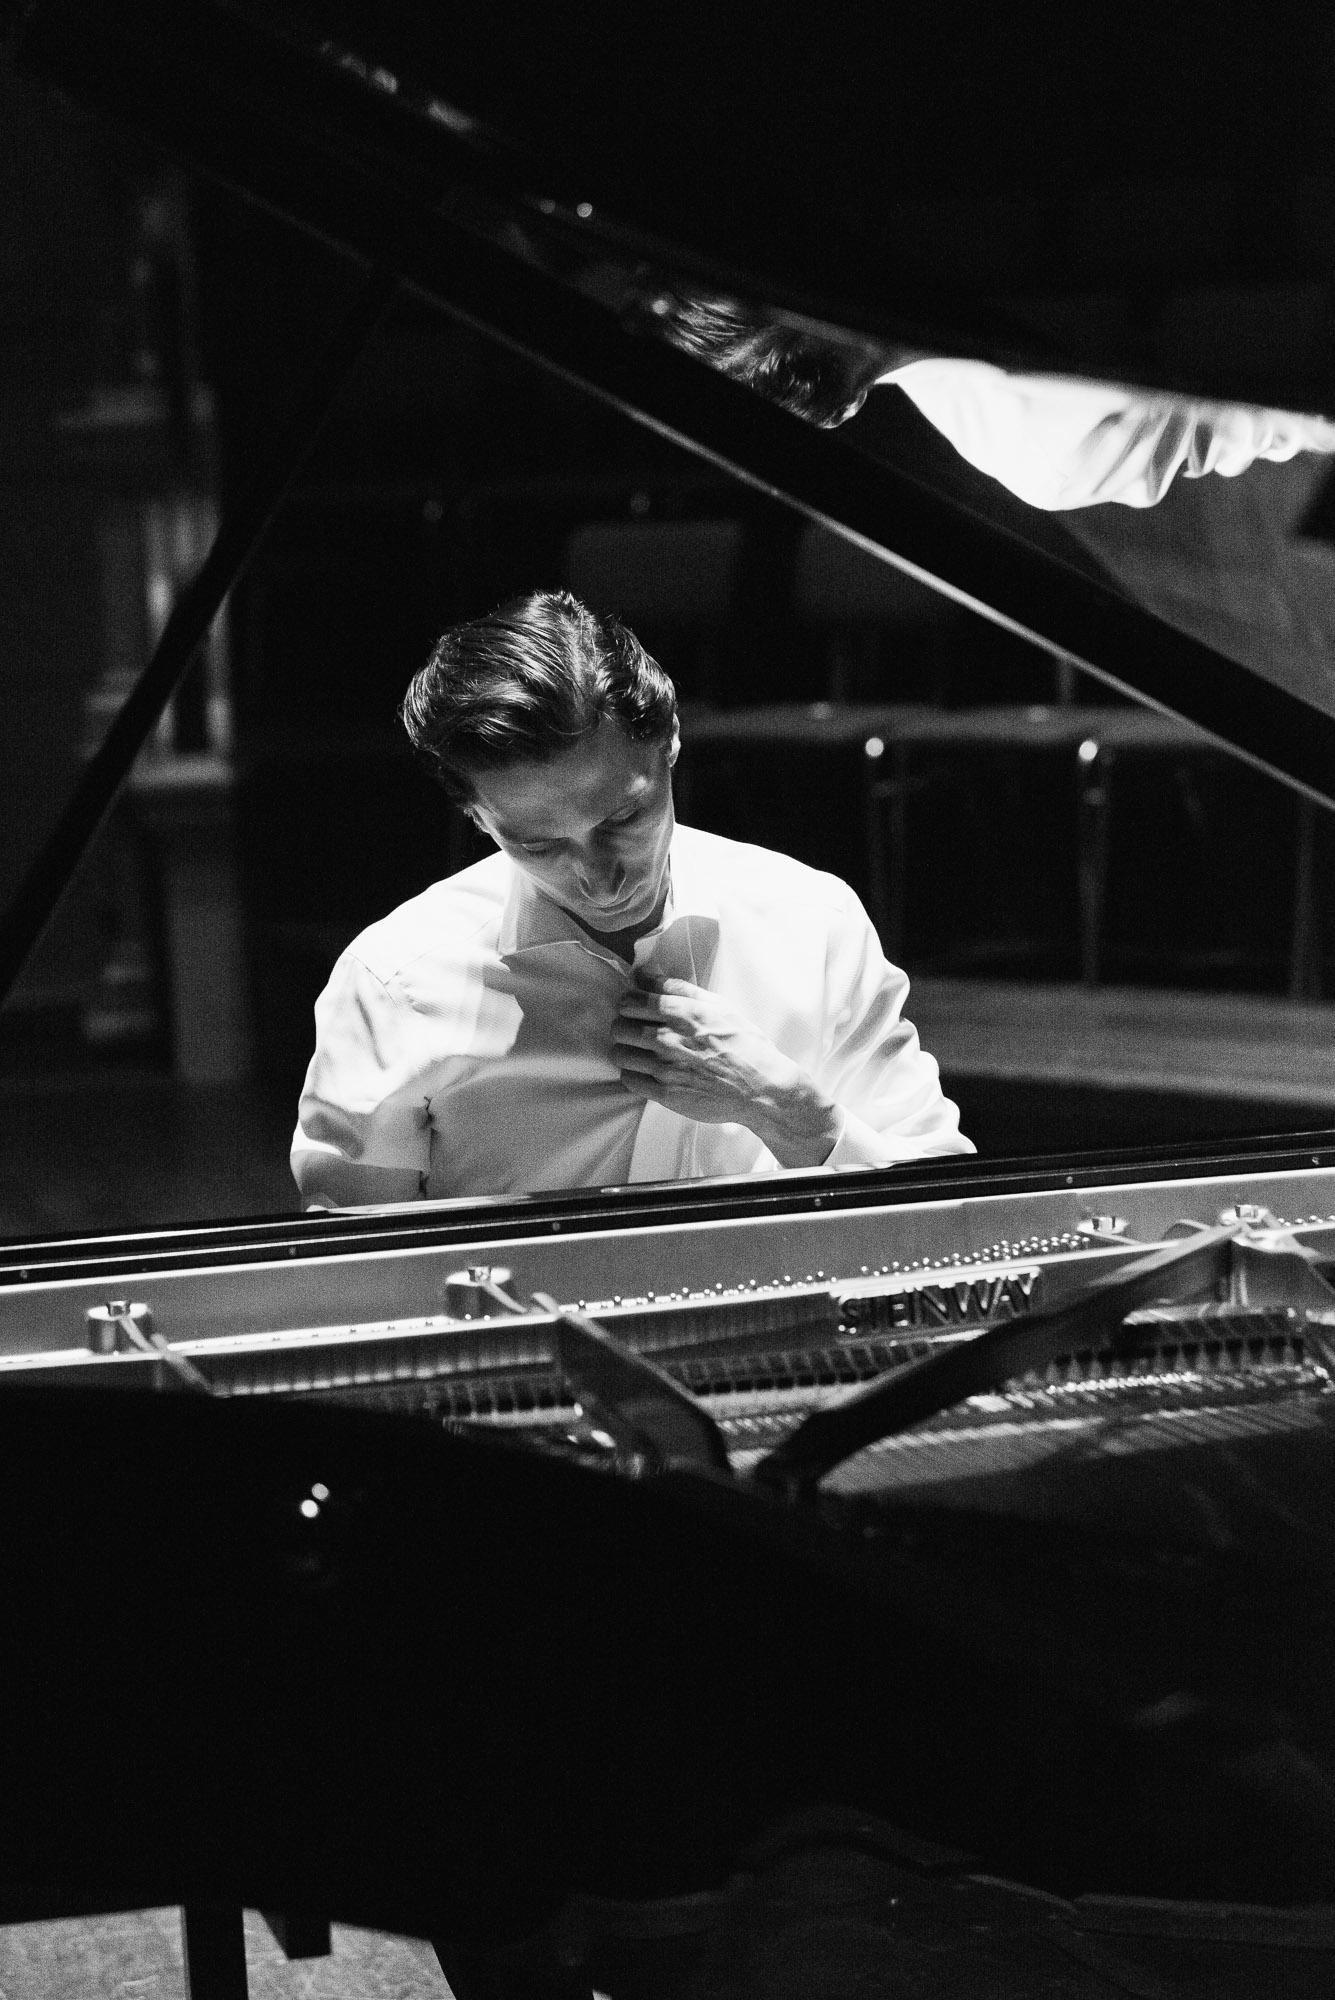 alexander-romanovsky-meesterpianisten-6.jpg